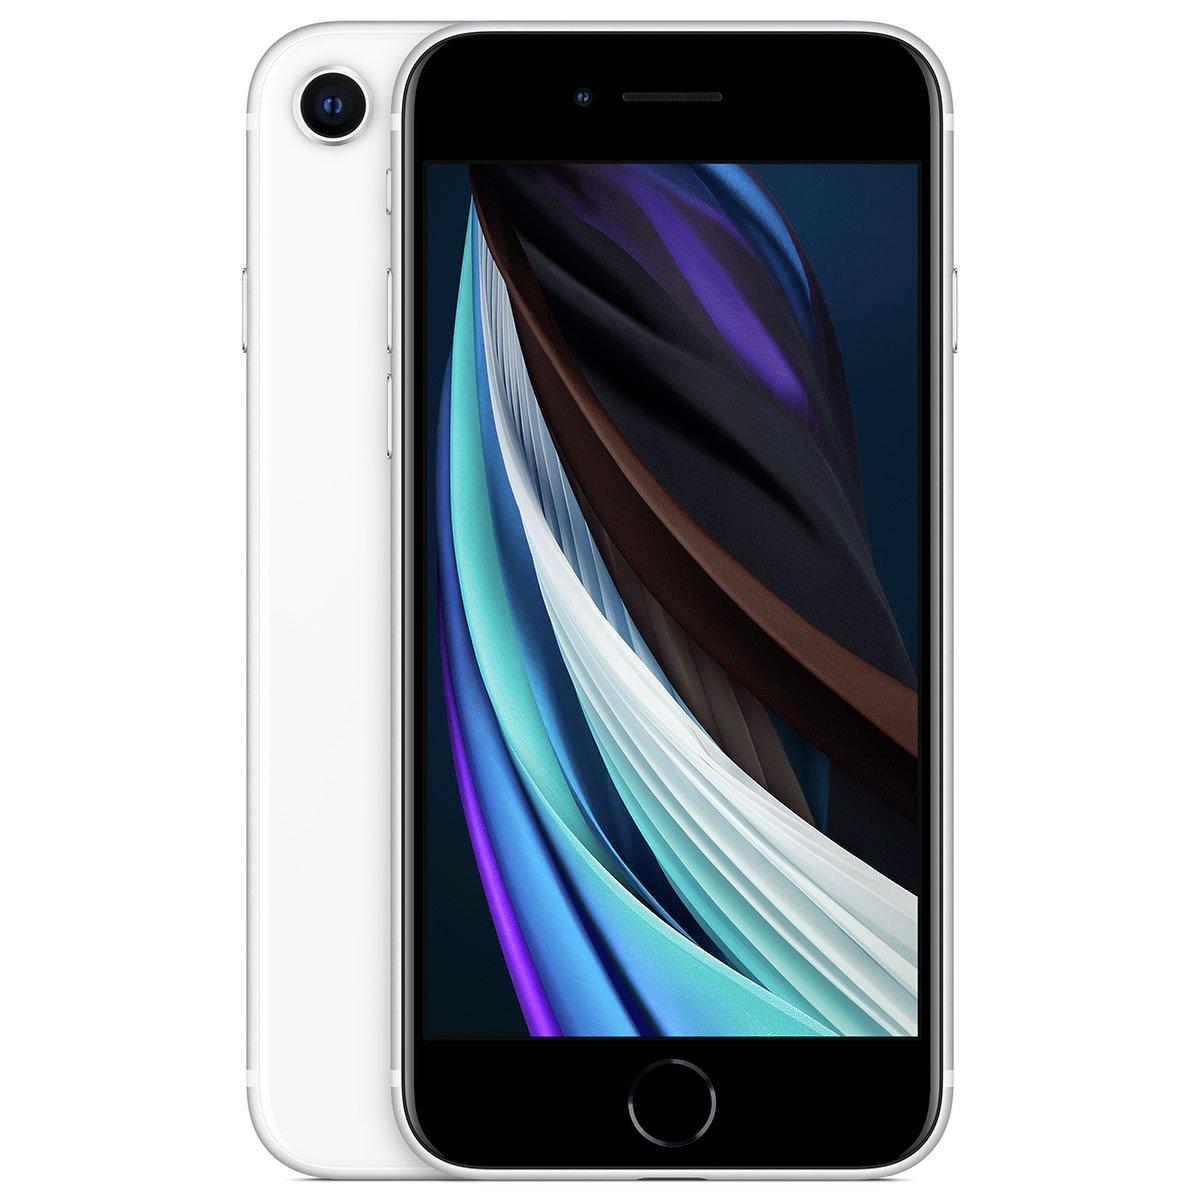 SIM Free iPhone SE 128GB Mobile Phone - White